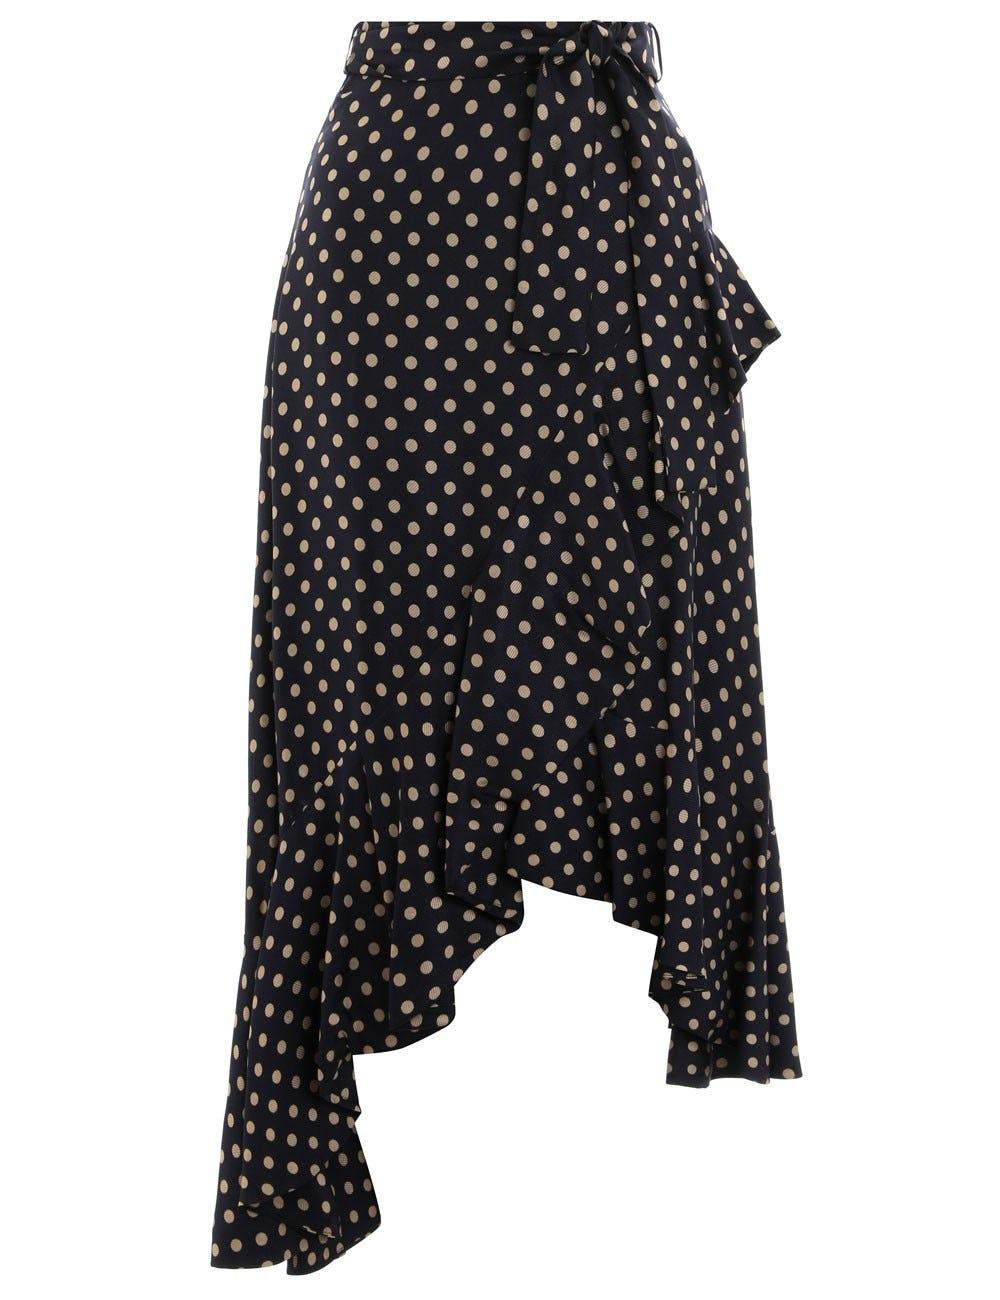 370d9886eab Cute Ways To Wear The Polka Dot Trend Winter 2018